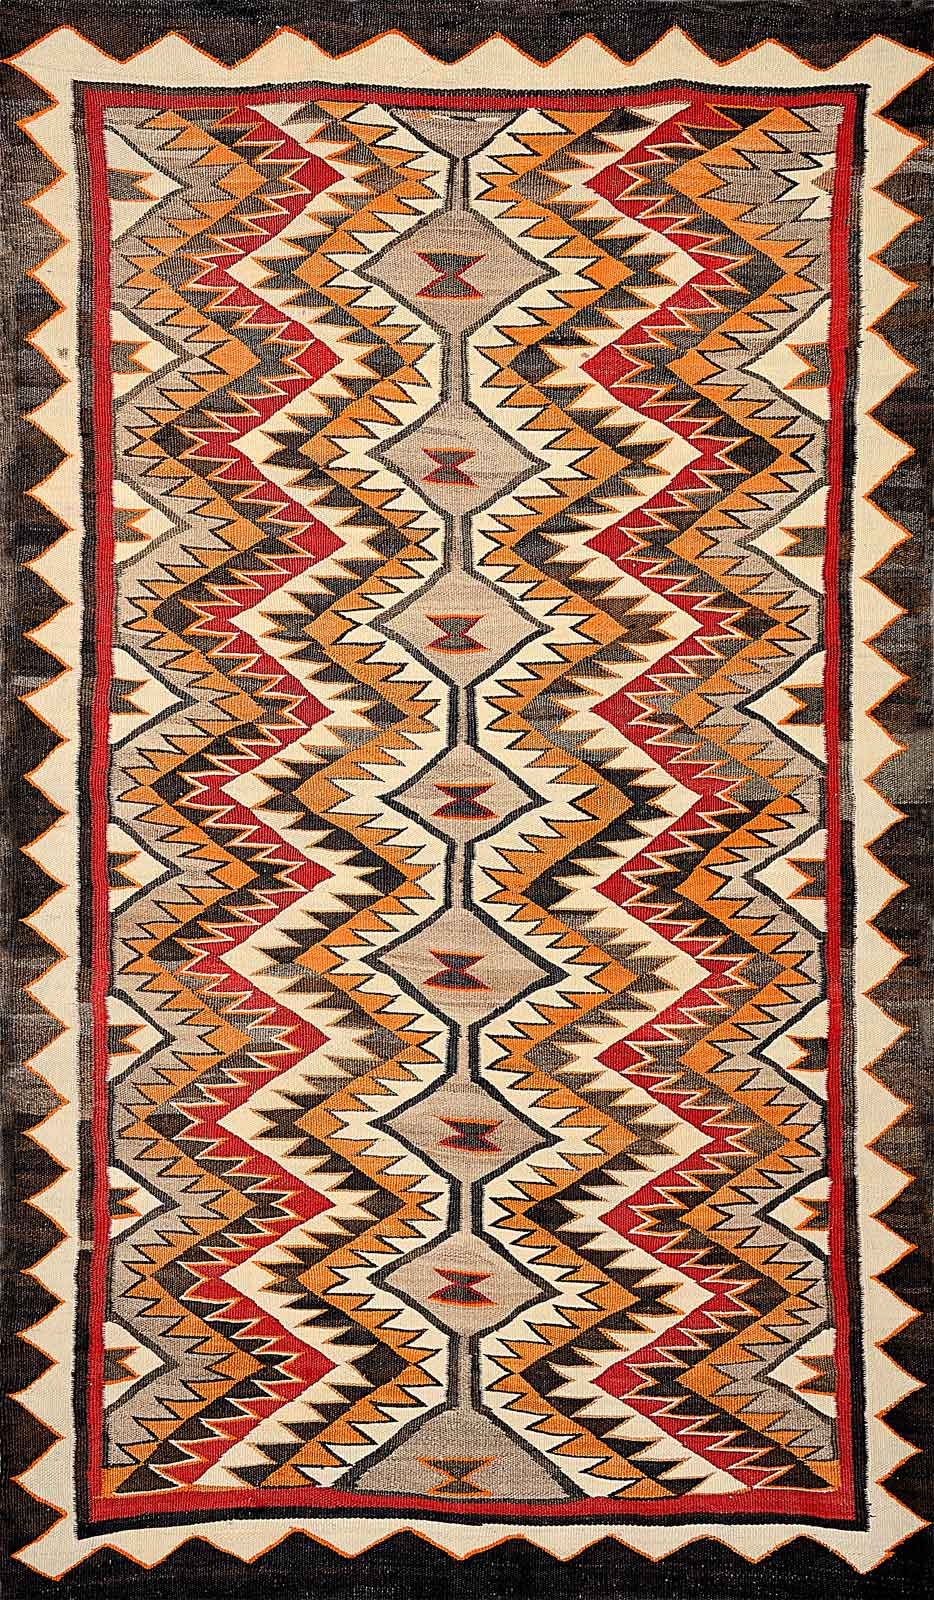 red mesa outline navajo weaving cira 1930 weaver unknown